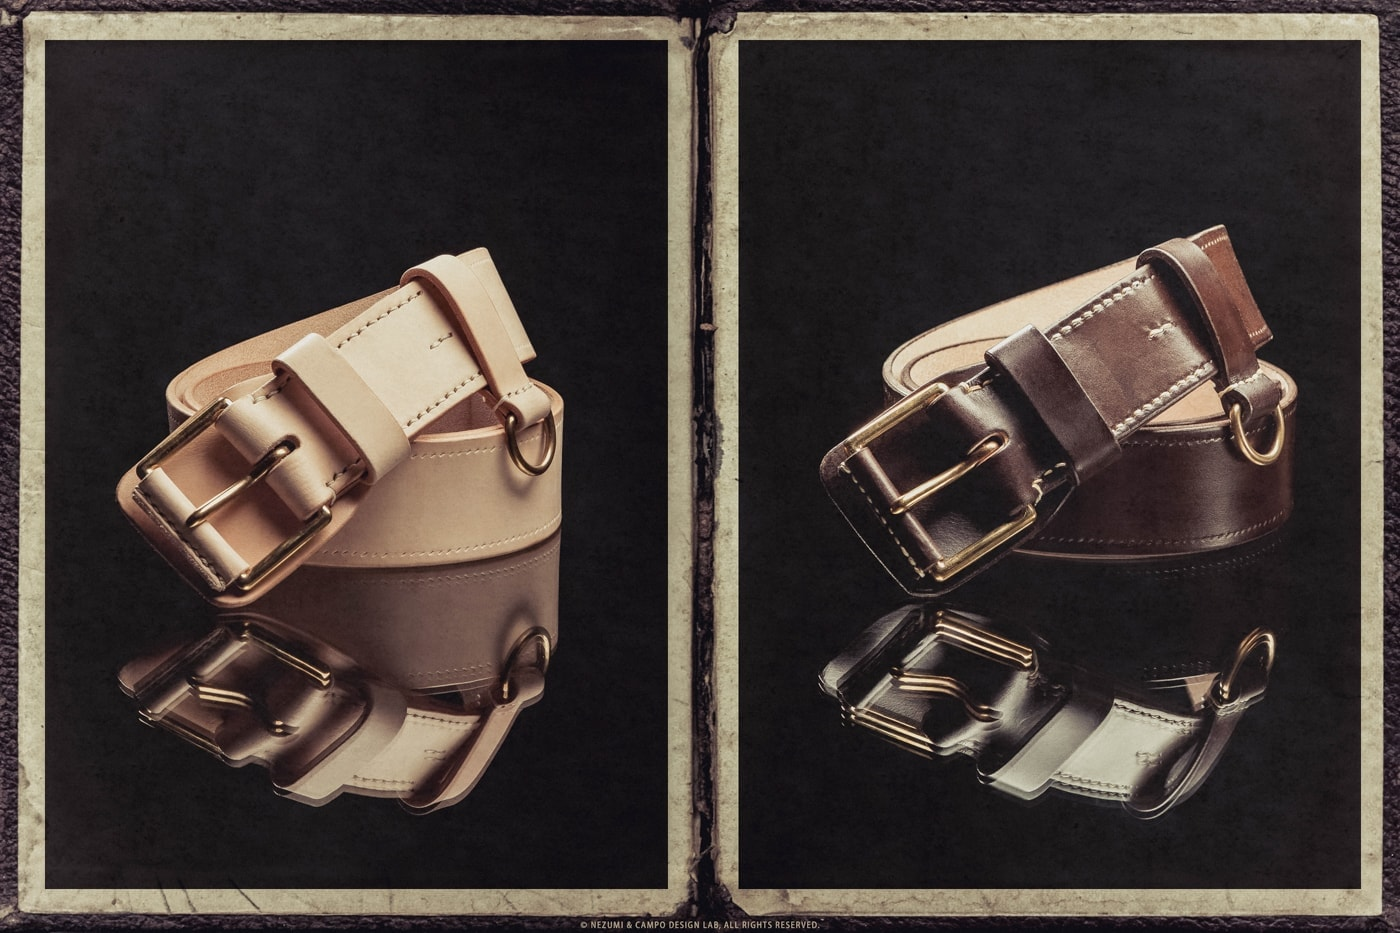 Nezumi Studios leather accessories collection